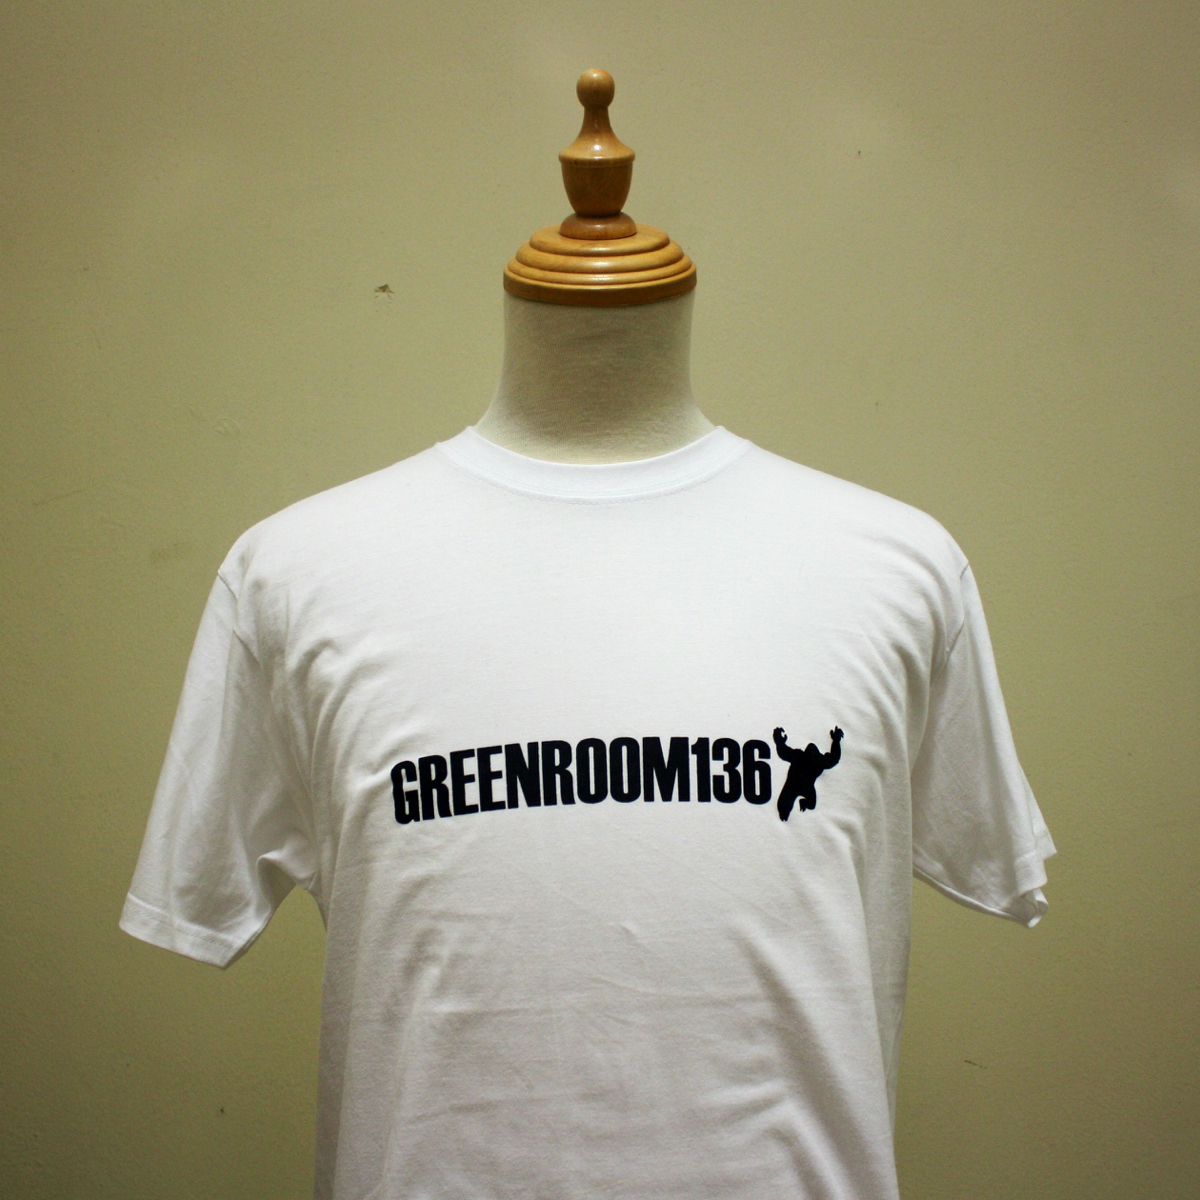 Greenroom136